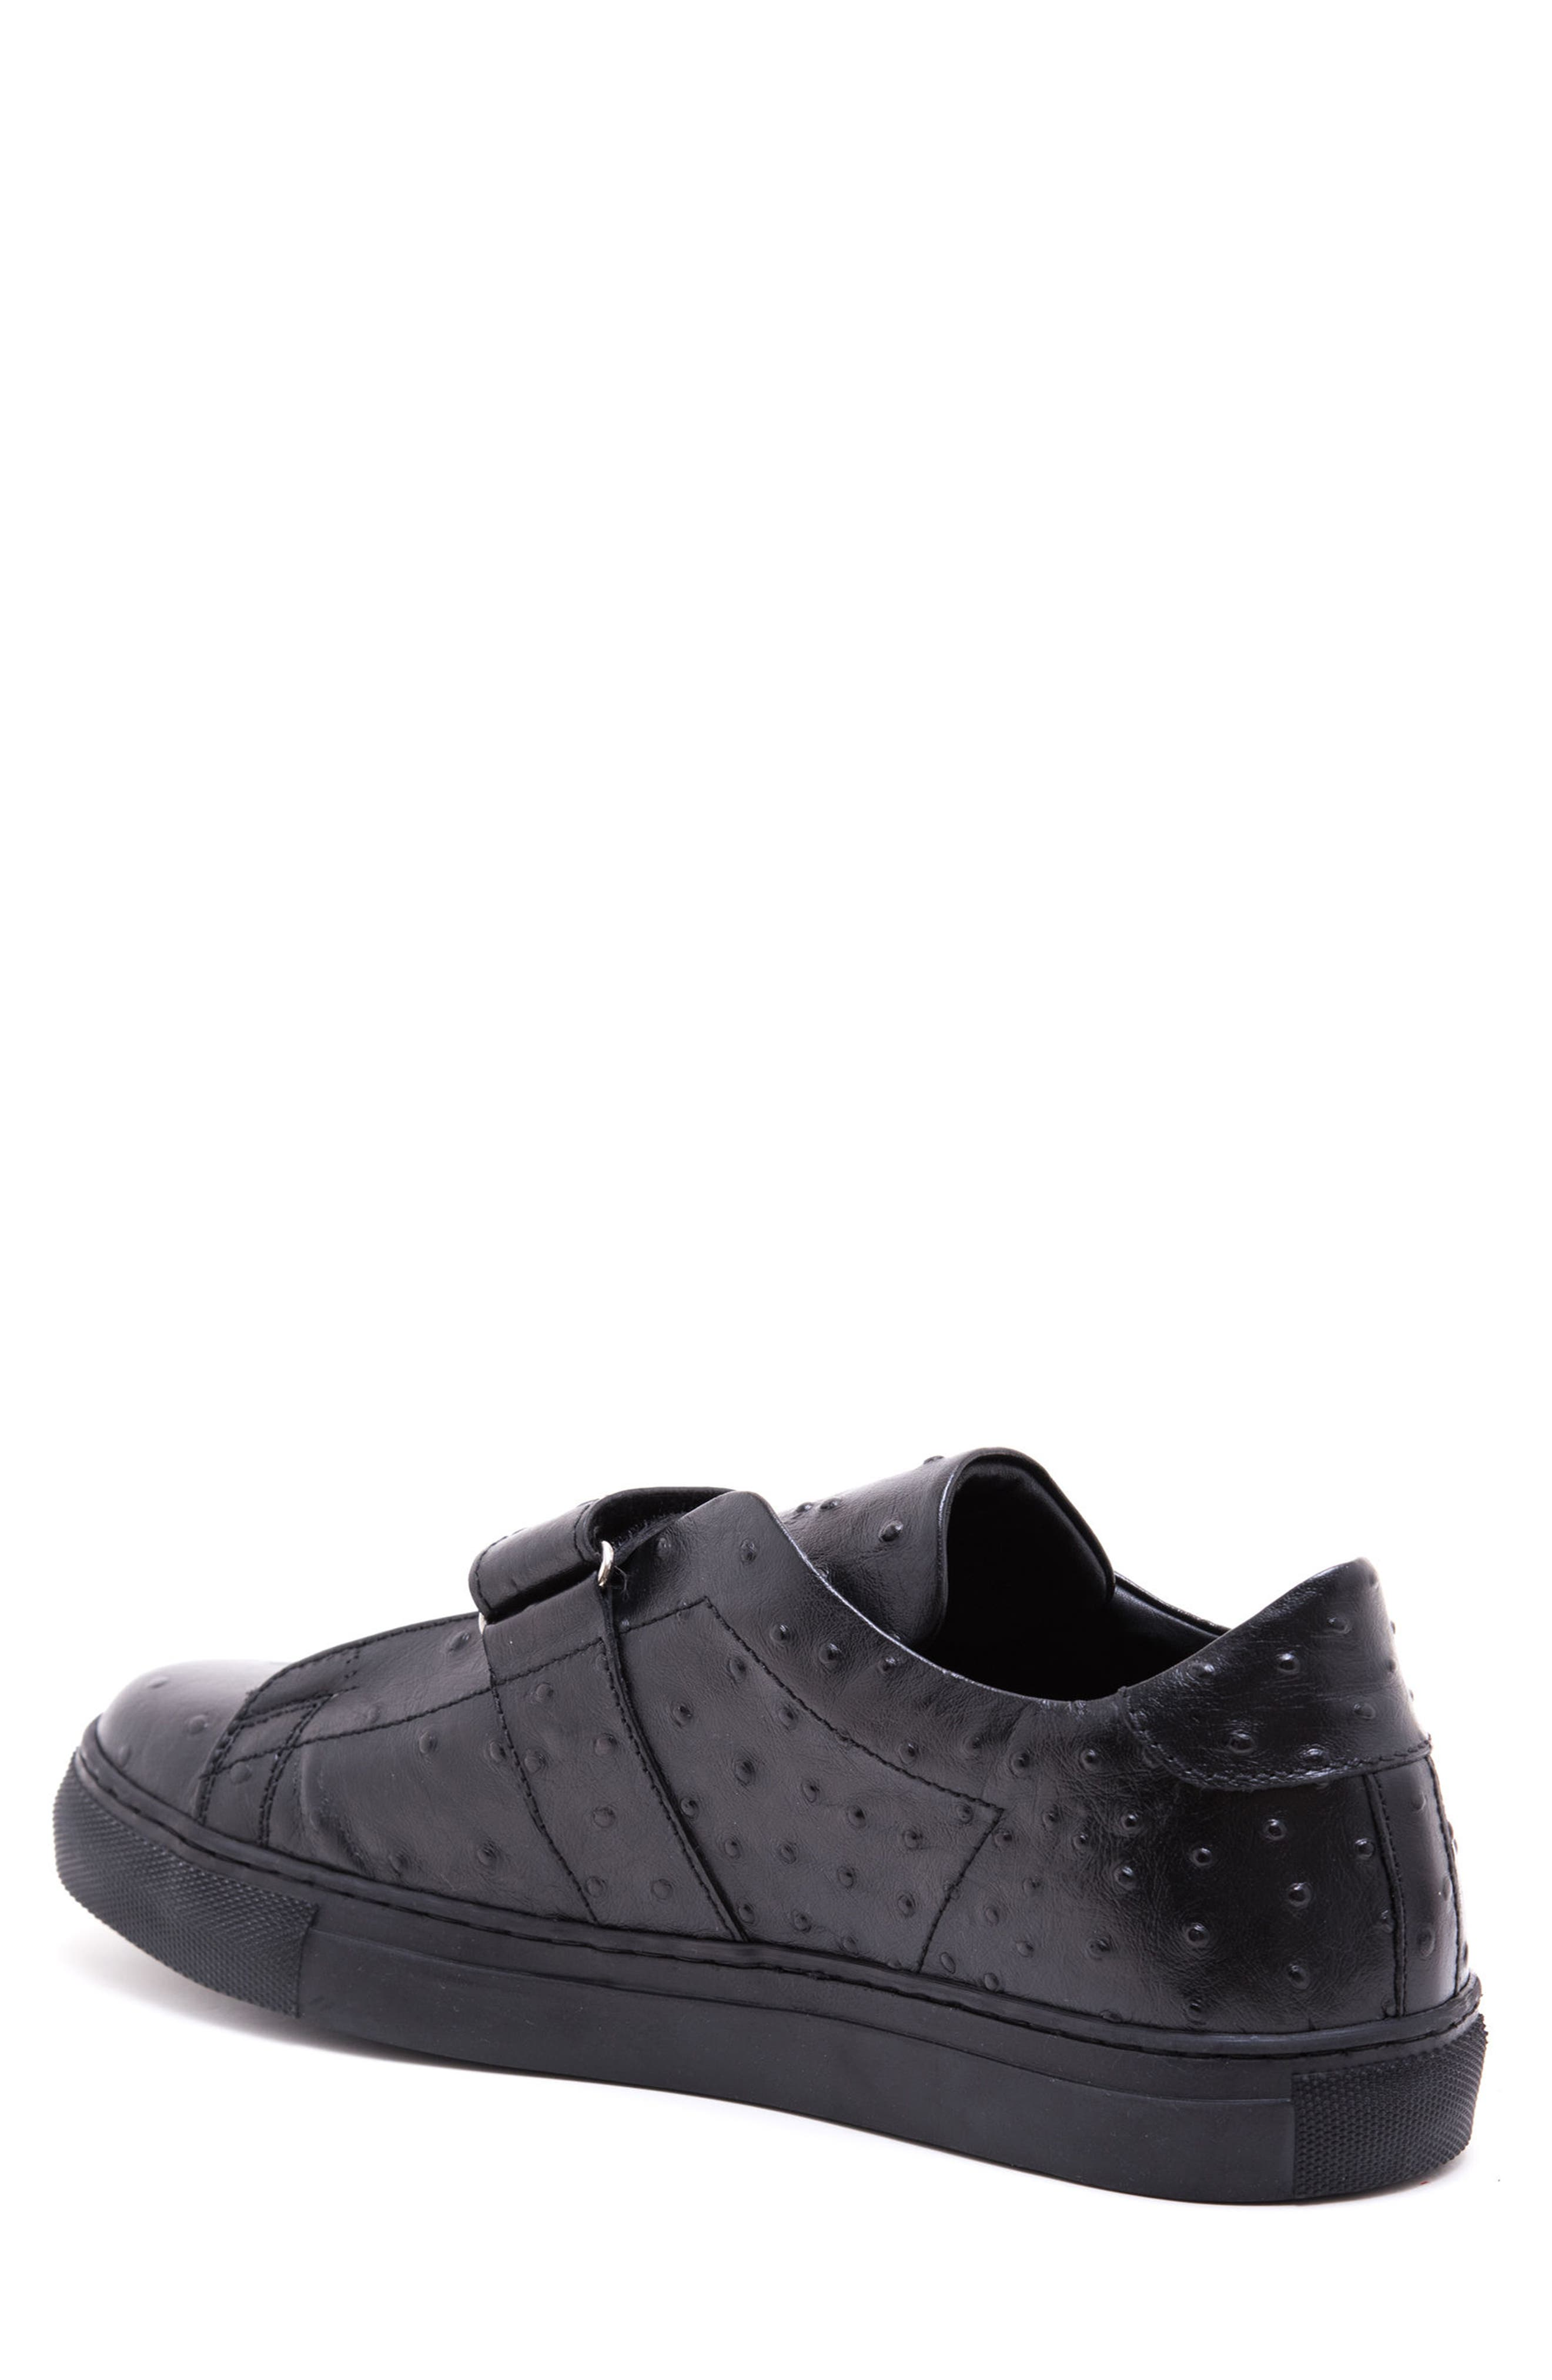 Alternate Image 2  - Jared Lang West Sneaker (Men)